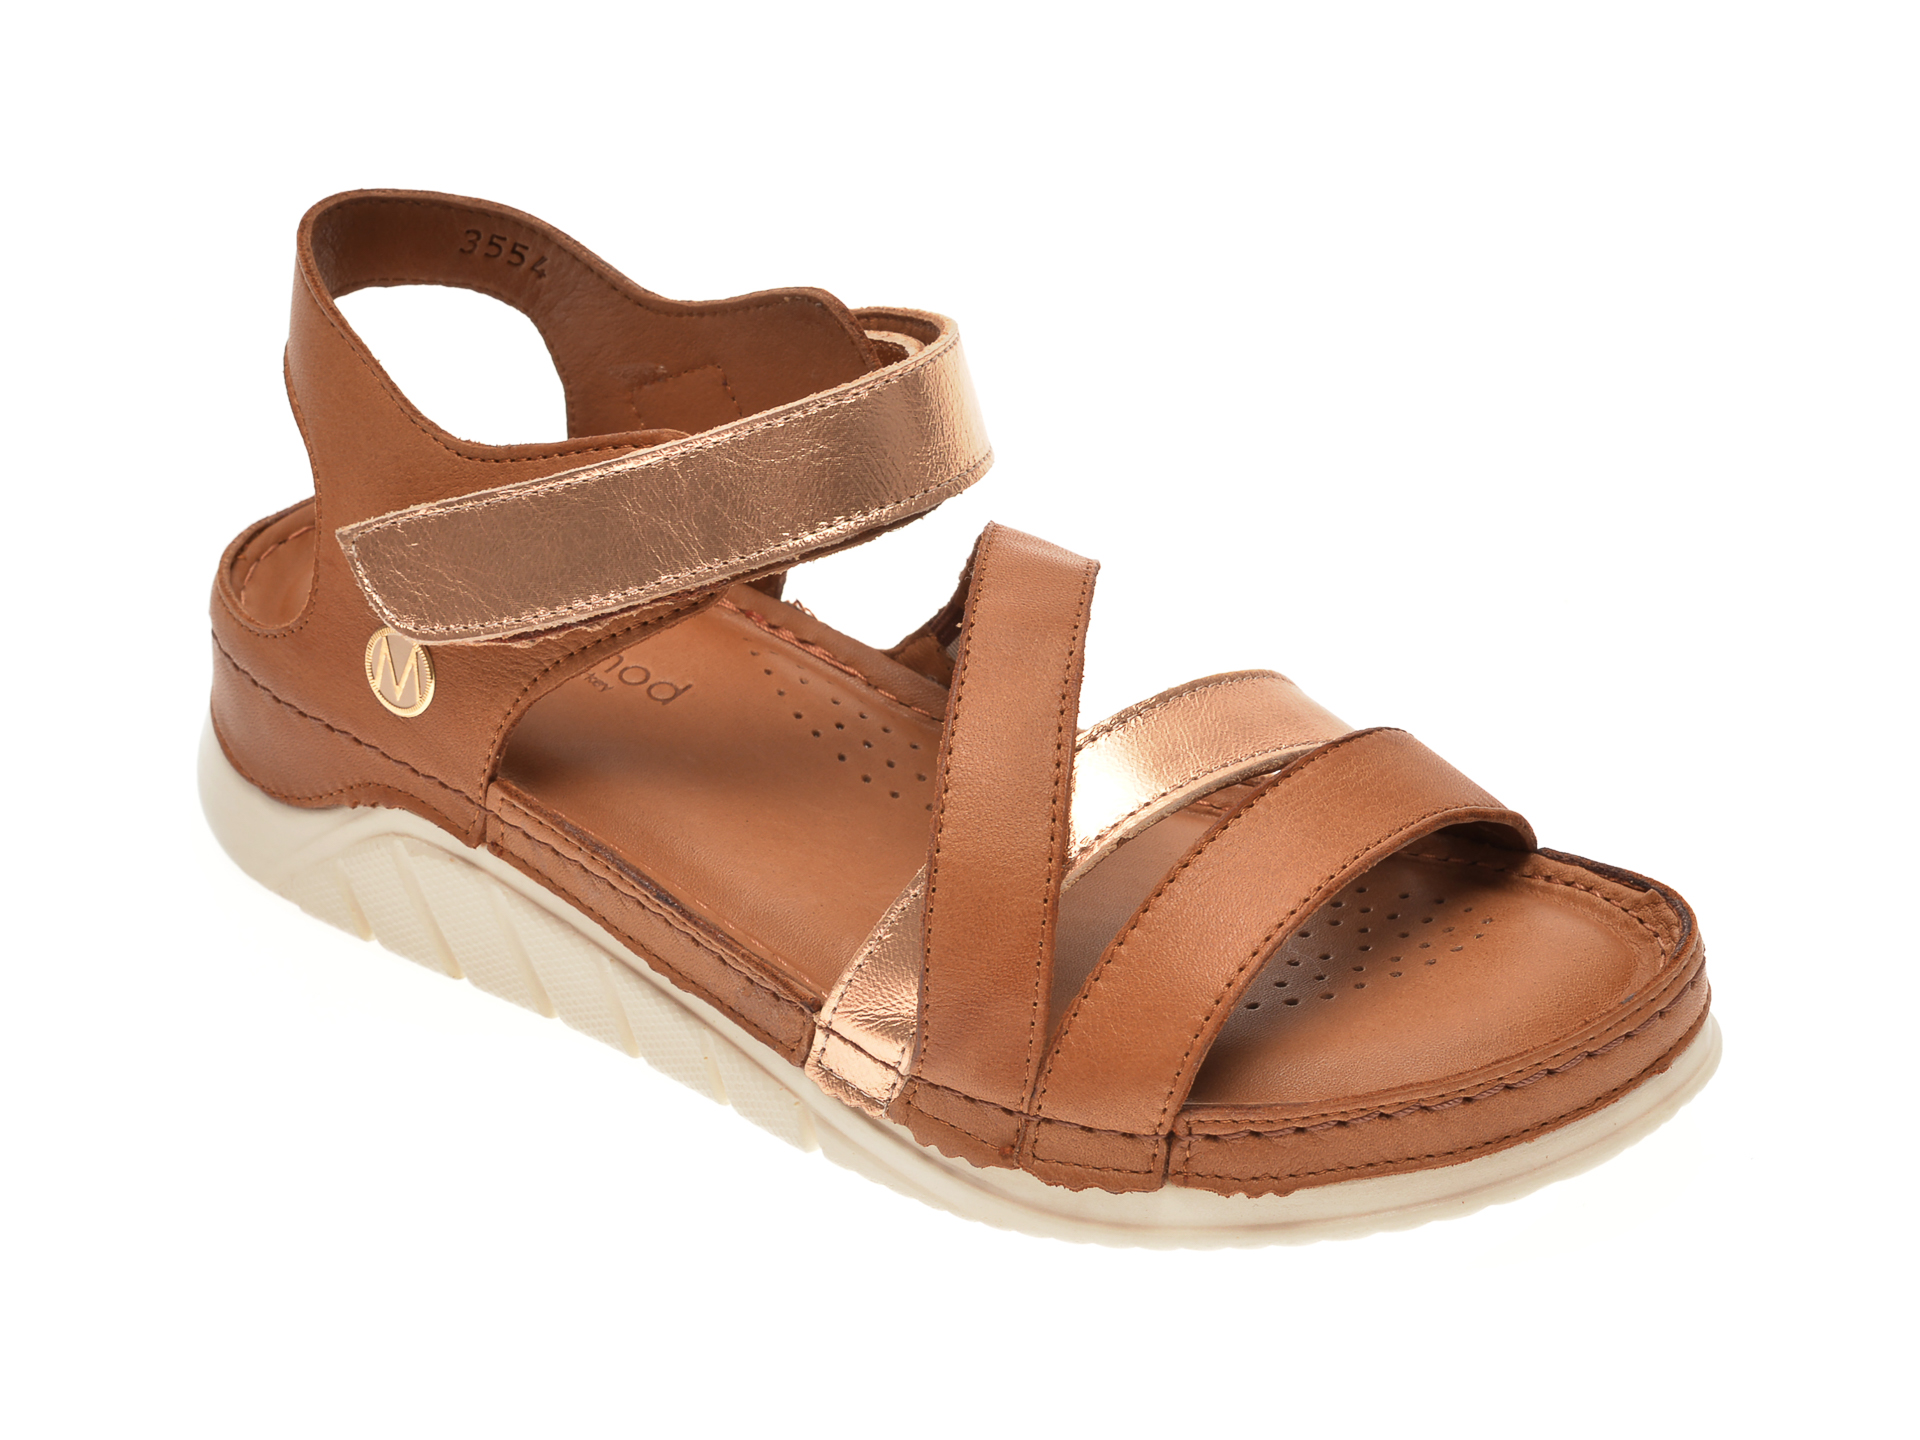 Sandale MESSIMODA maro, 20Y3554, din piele naturala